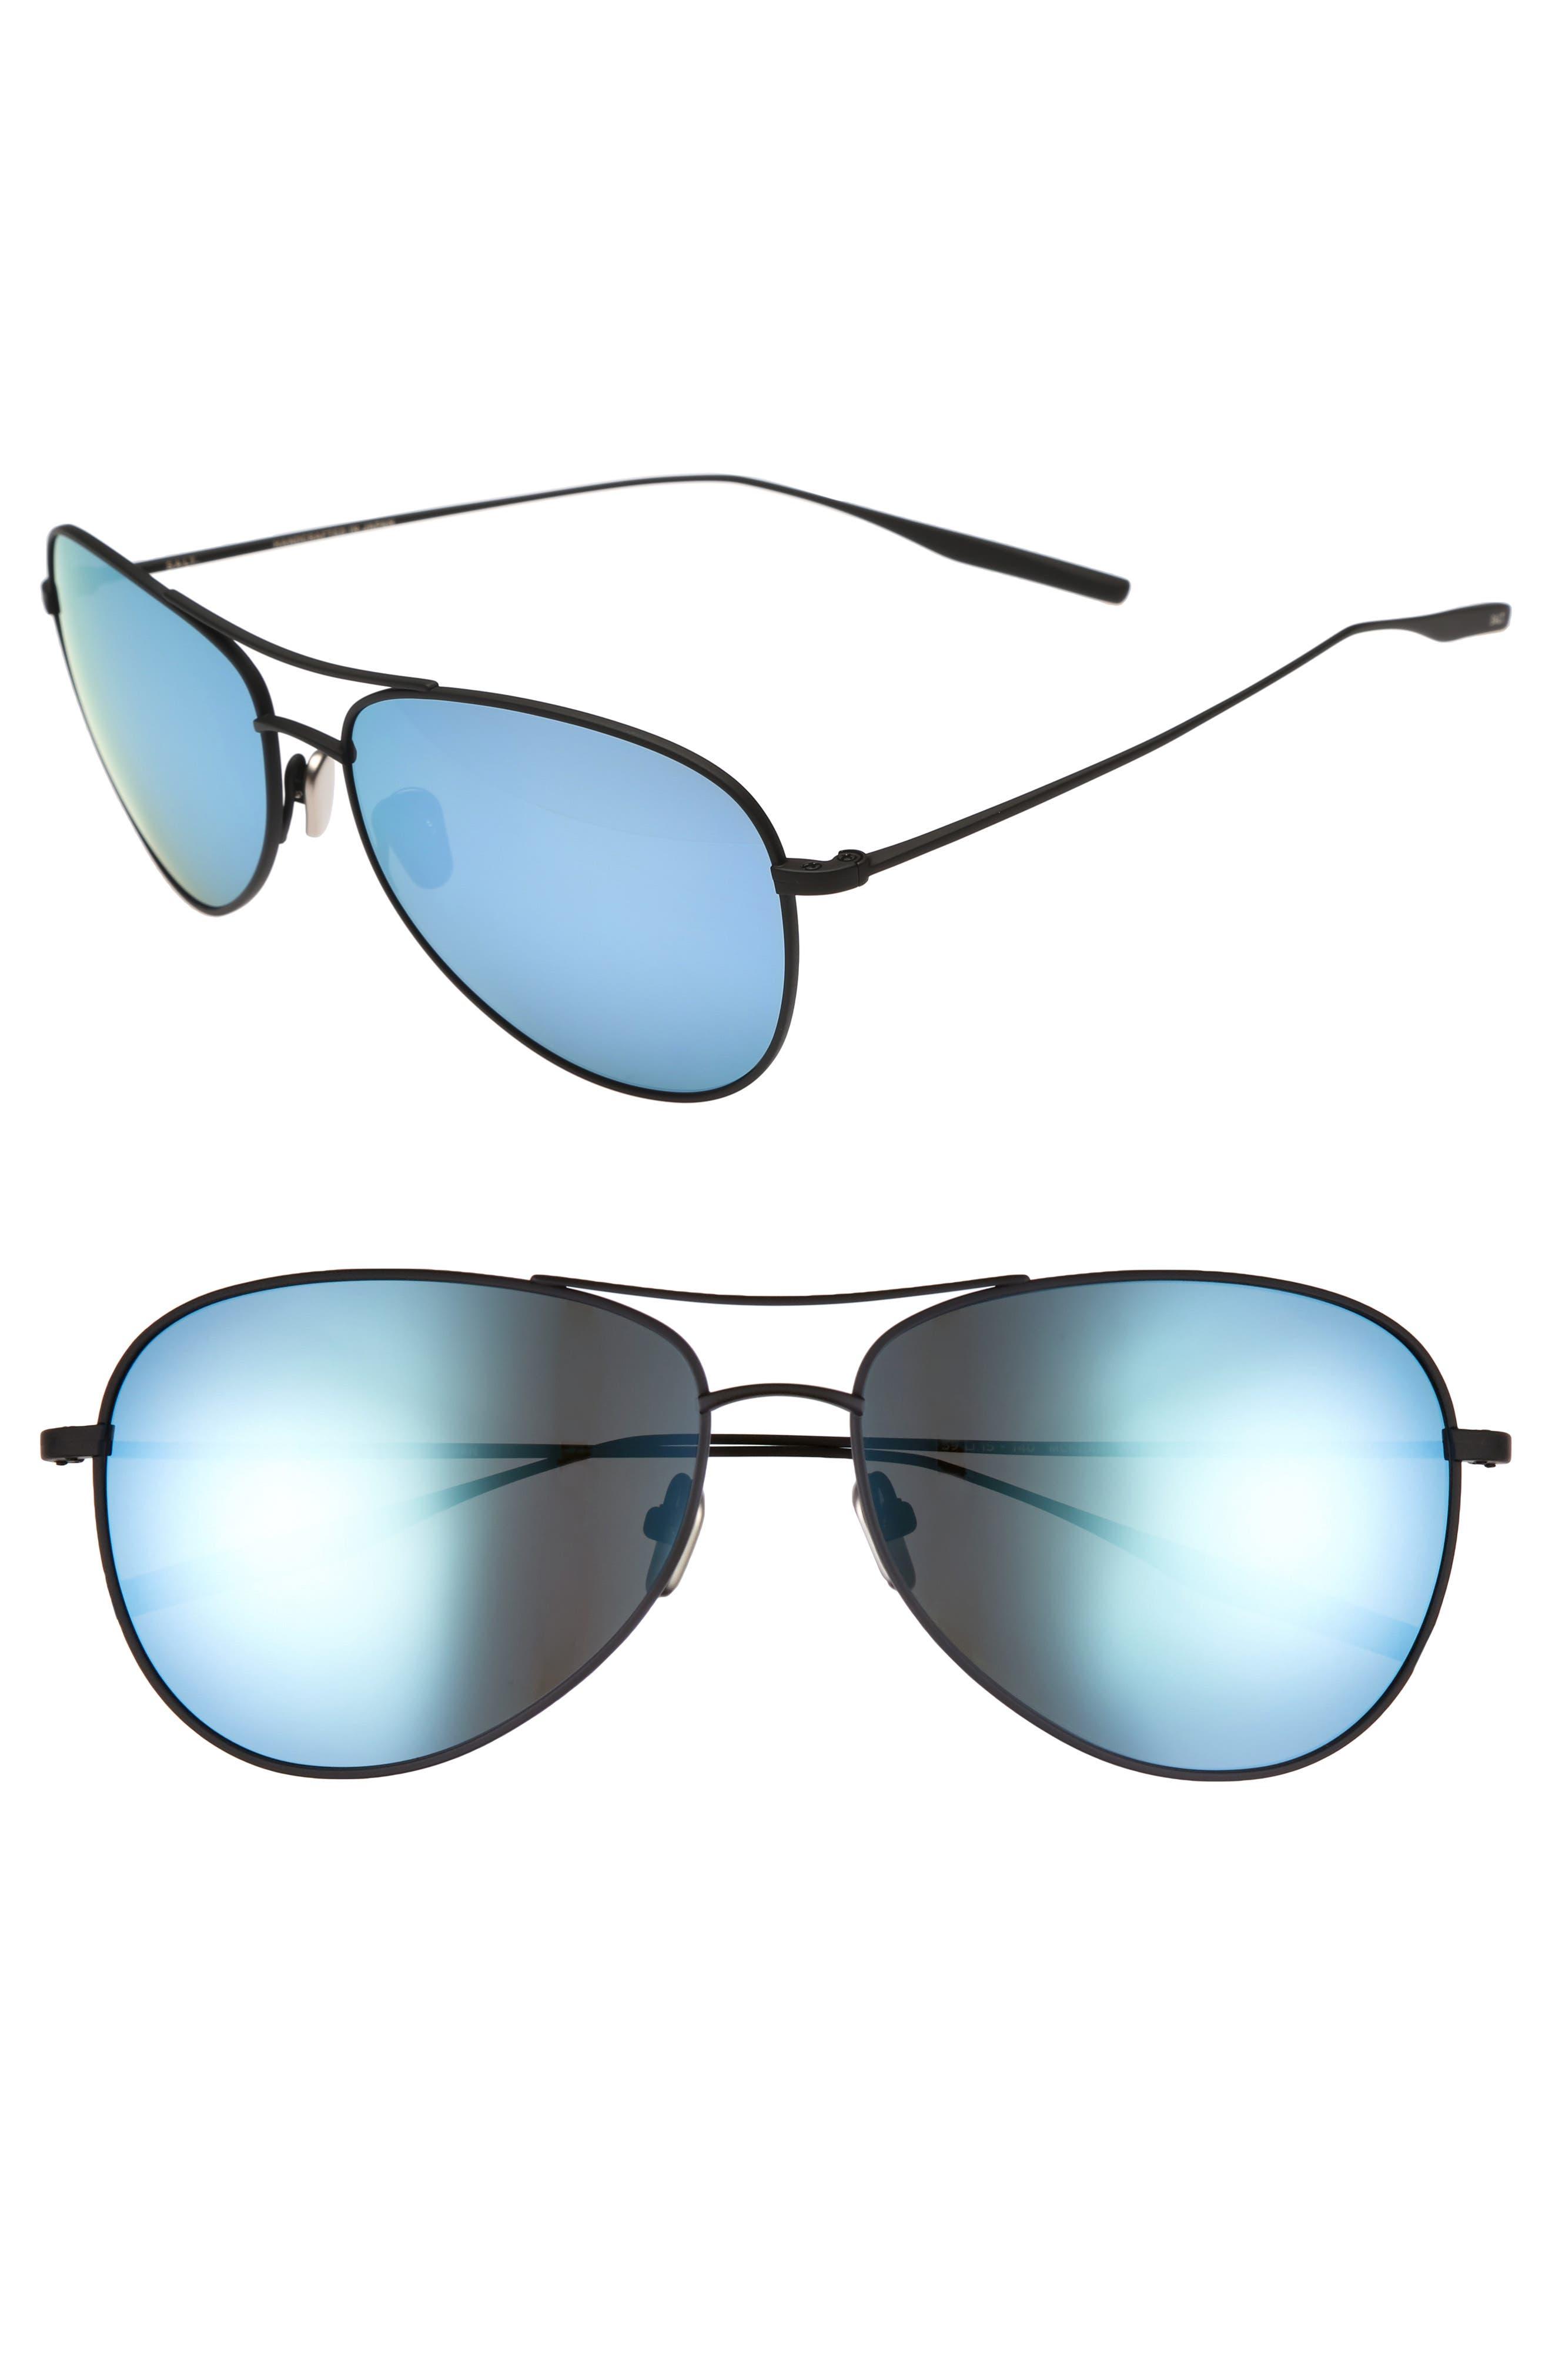 McKean 59mm Aviator Sunglasses,                         Main,                         color, Black Sand / Mirror Blue